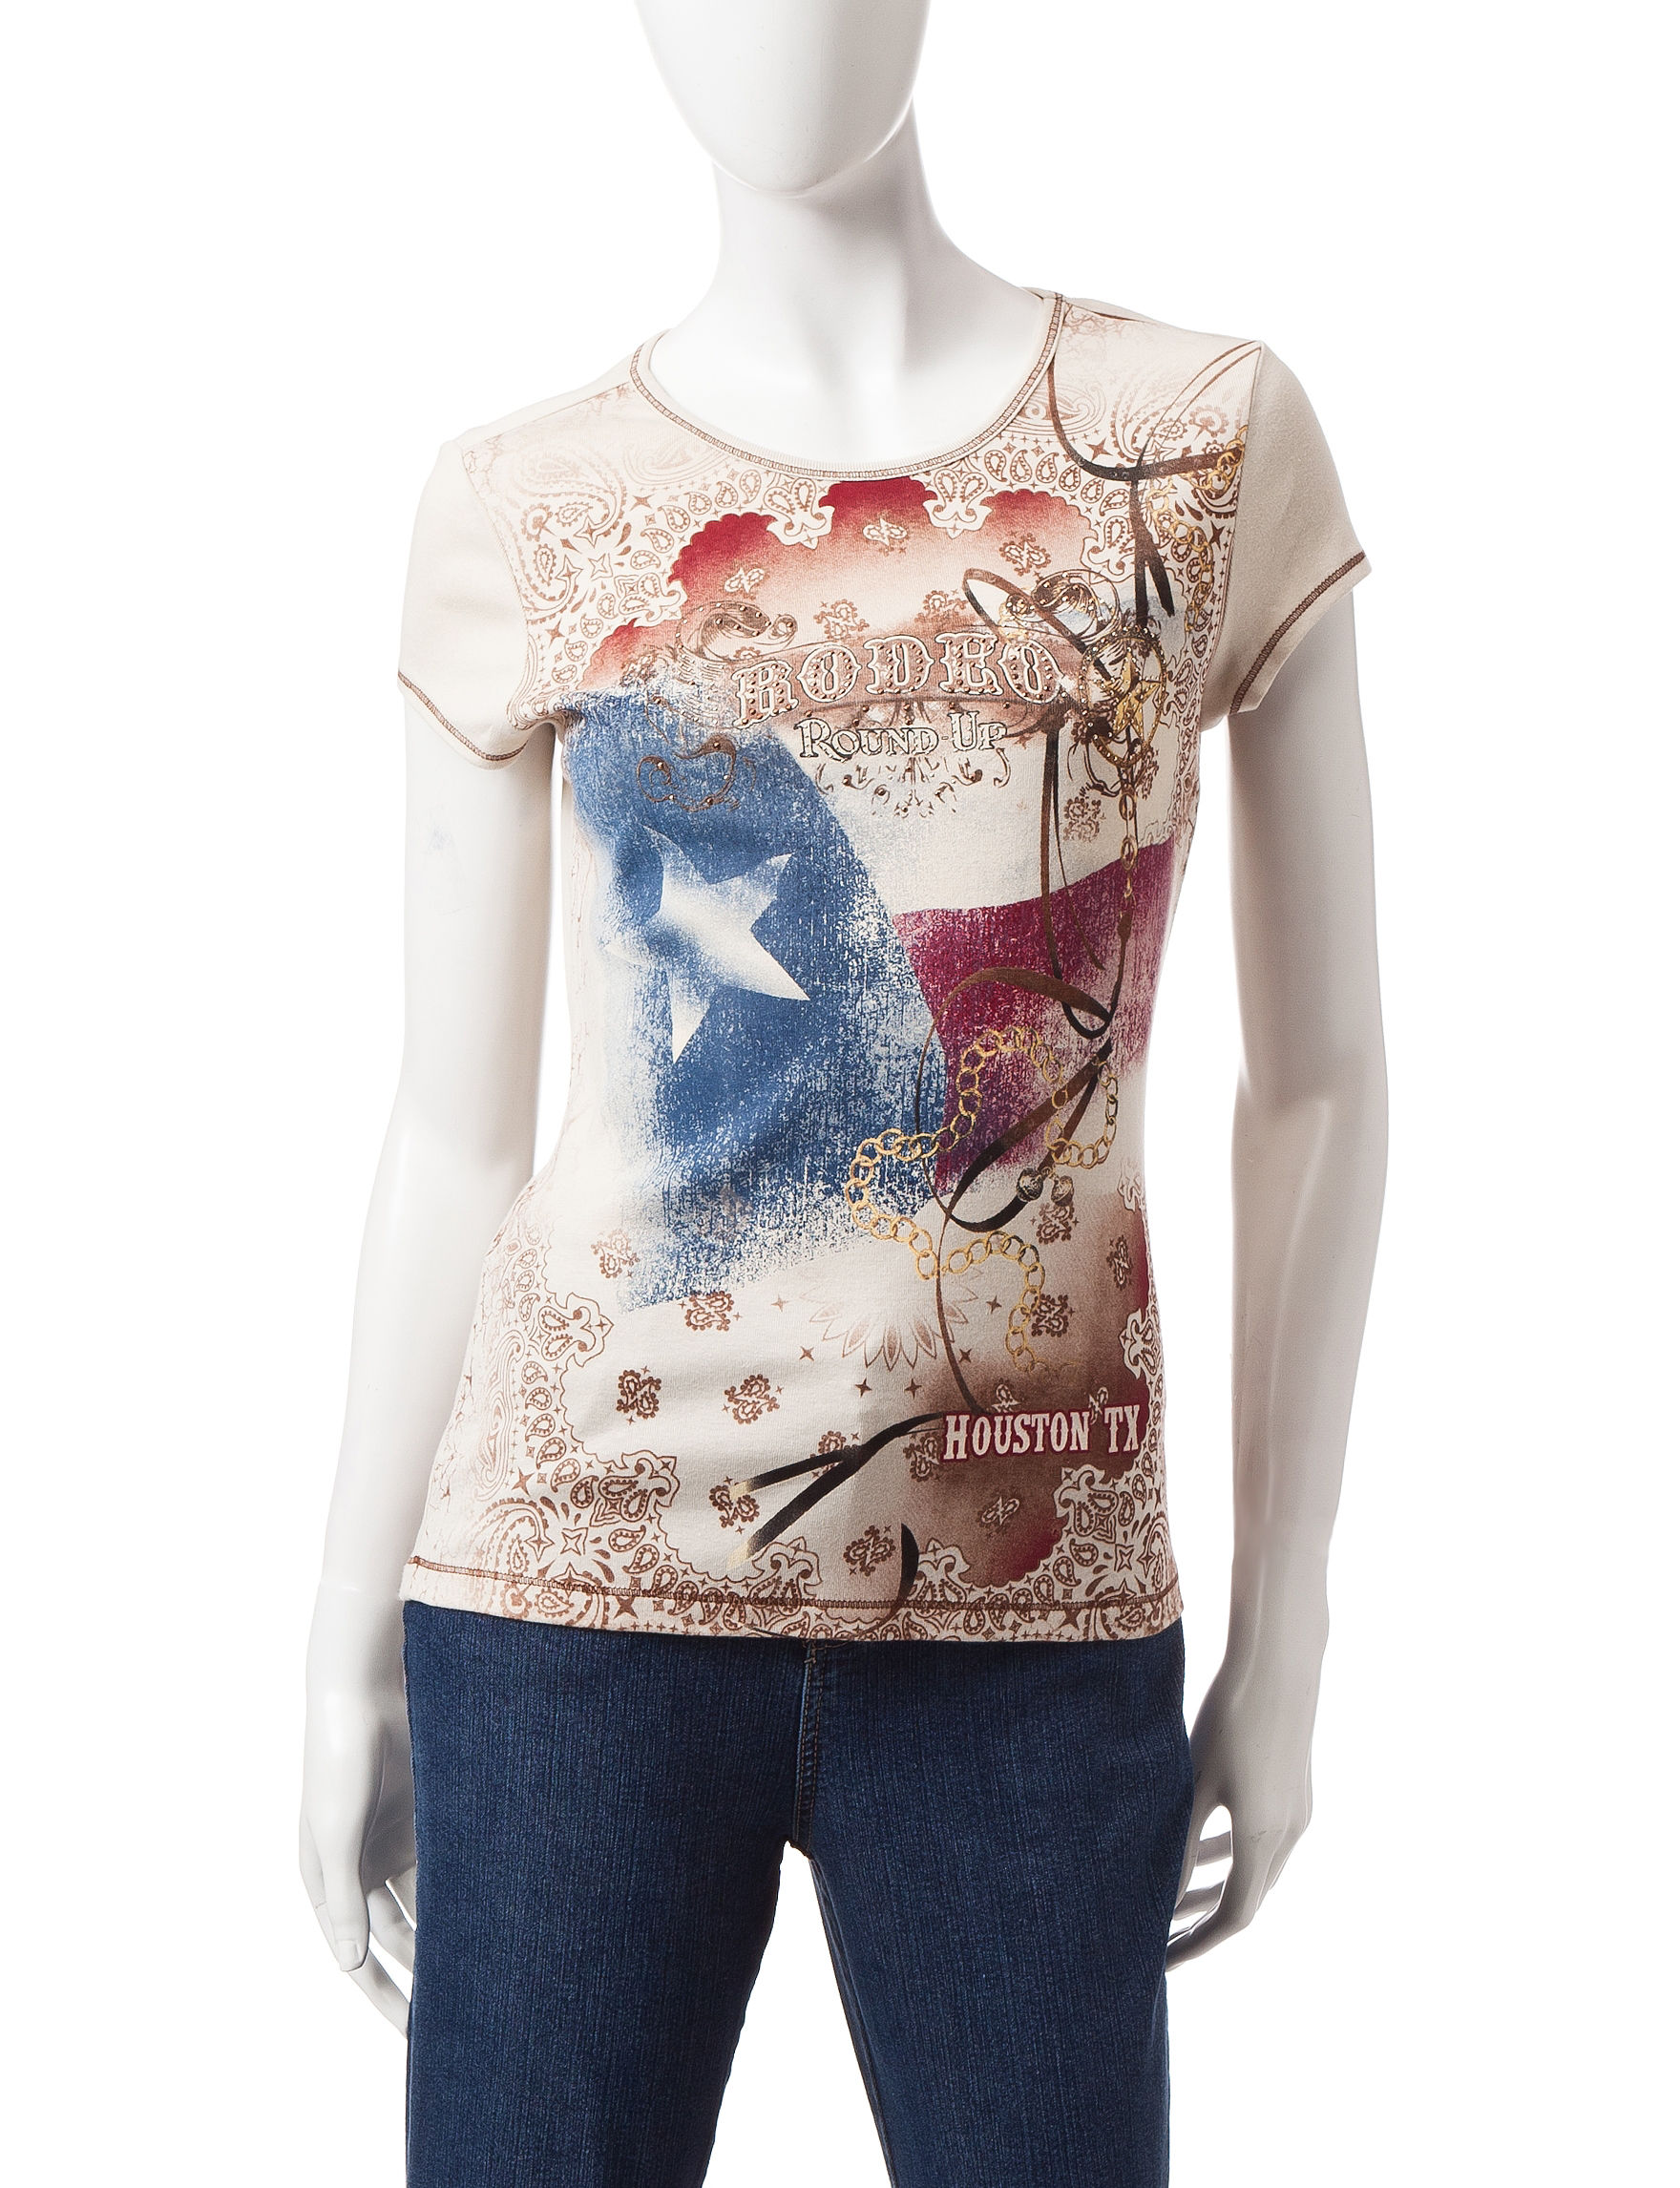 Blue Canyon Taupe Shirts & Blouses Tees & Tanks